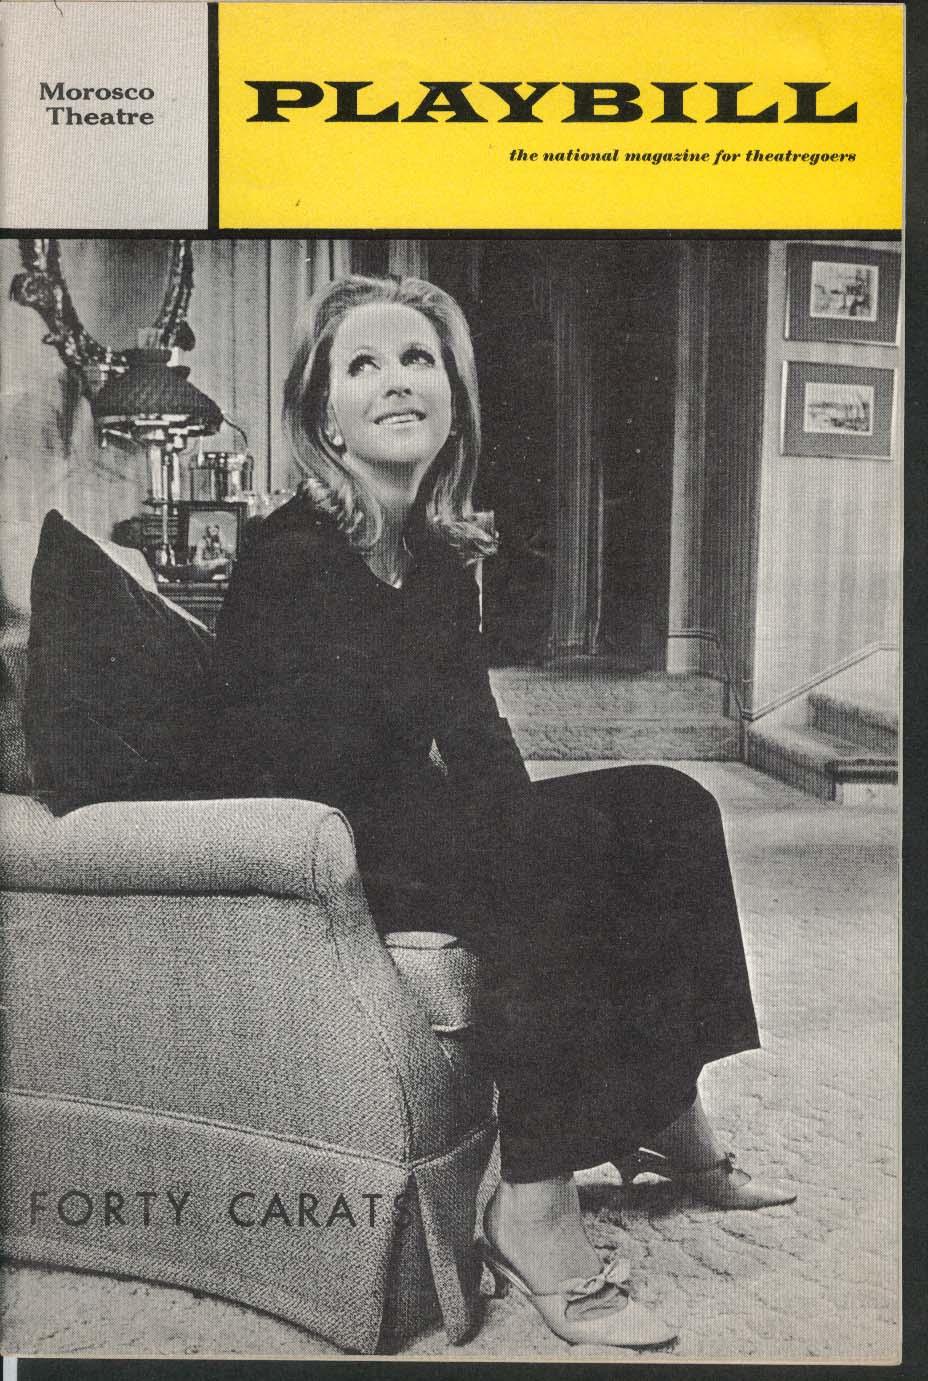 Forty Carats Playbill 9/1969 Julie Harris Marco St John Morosco Theatre